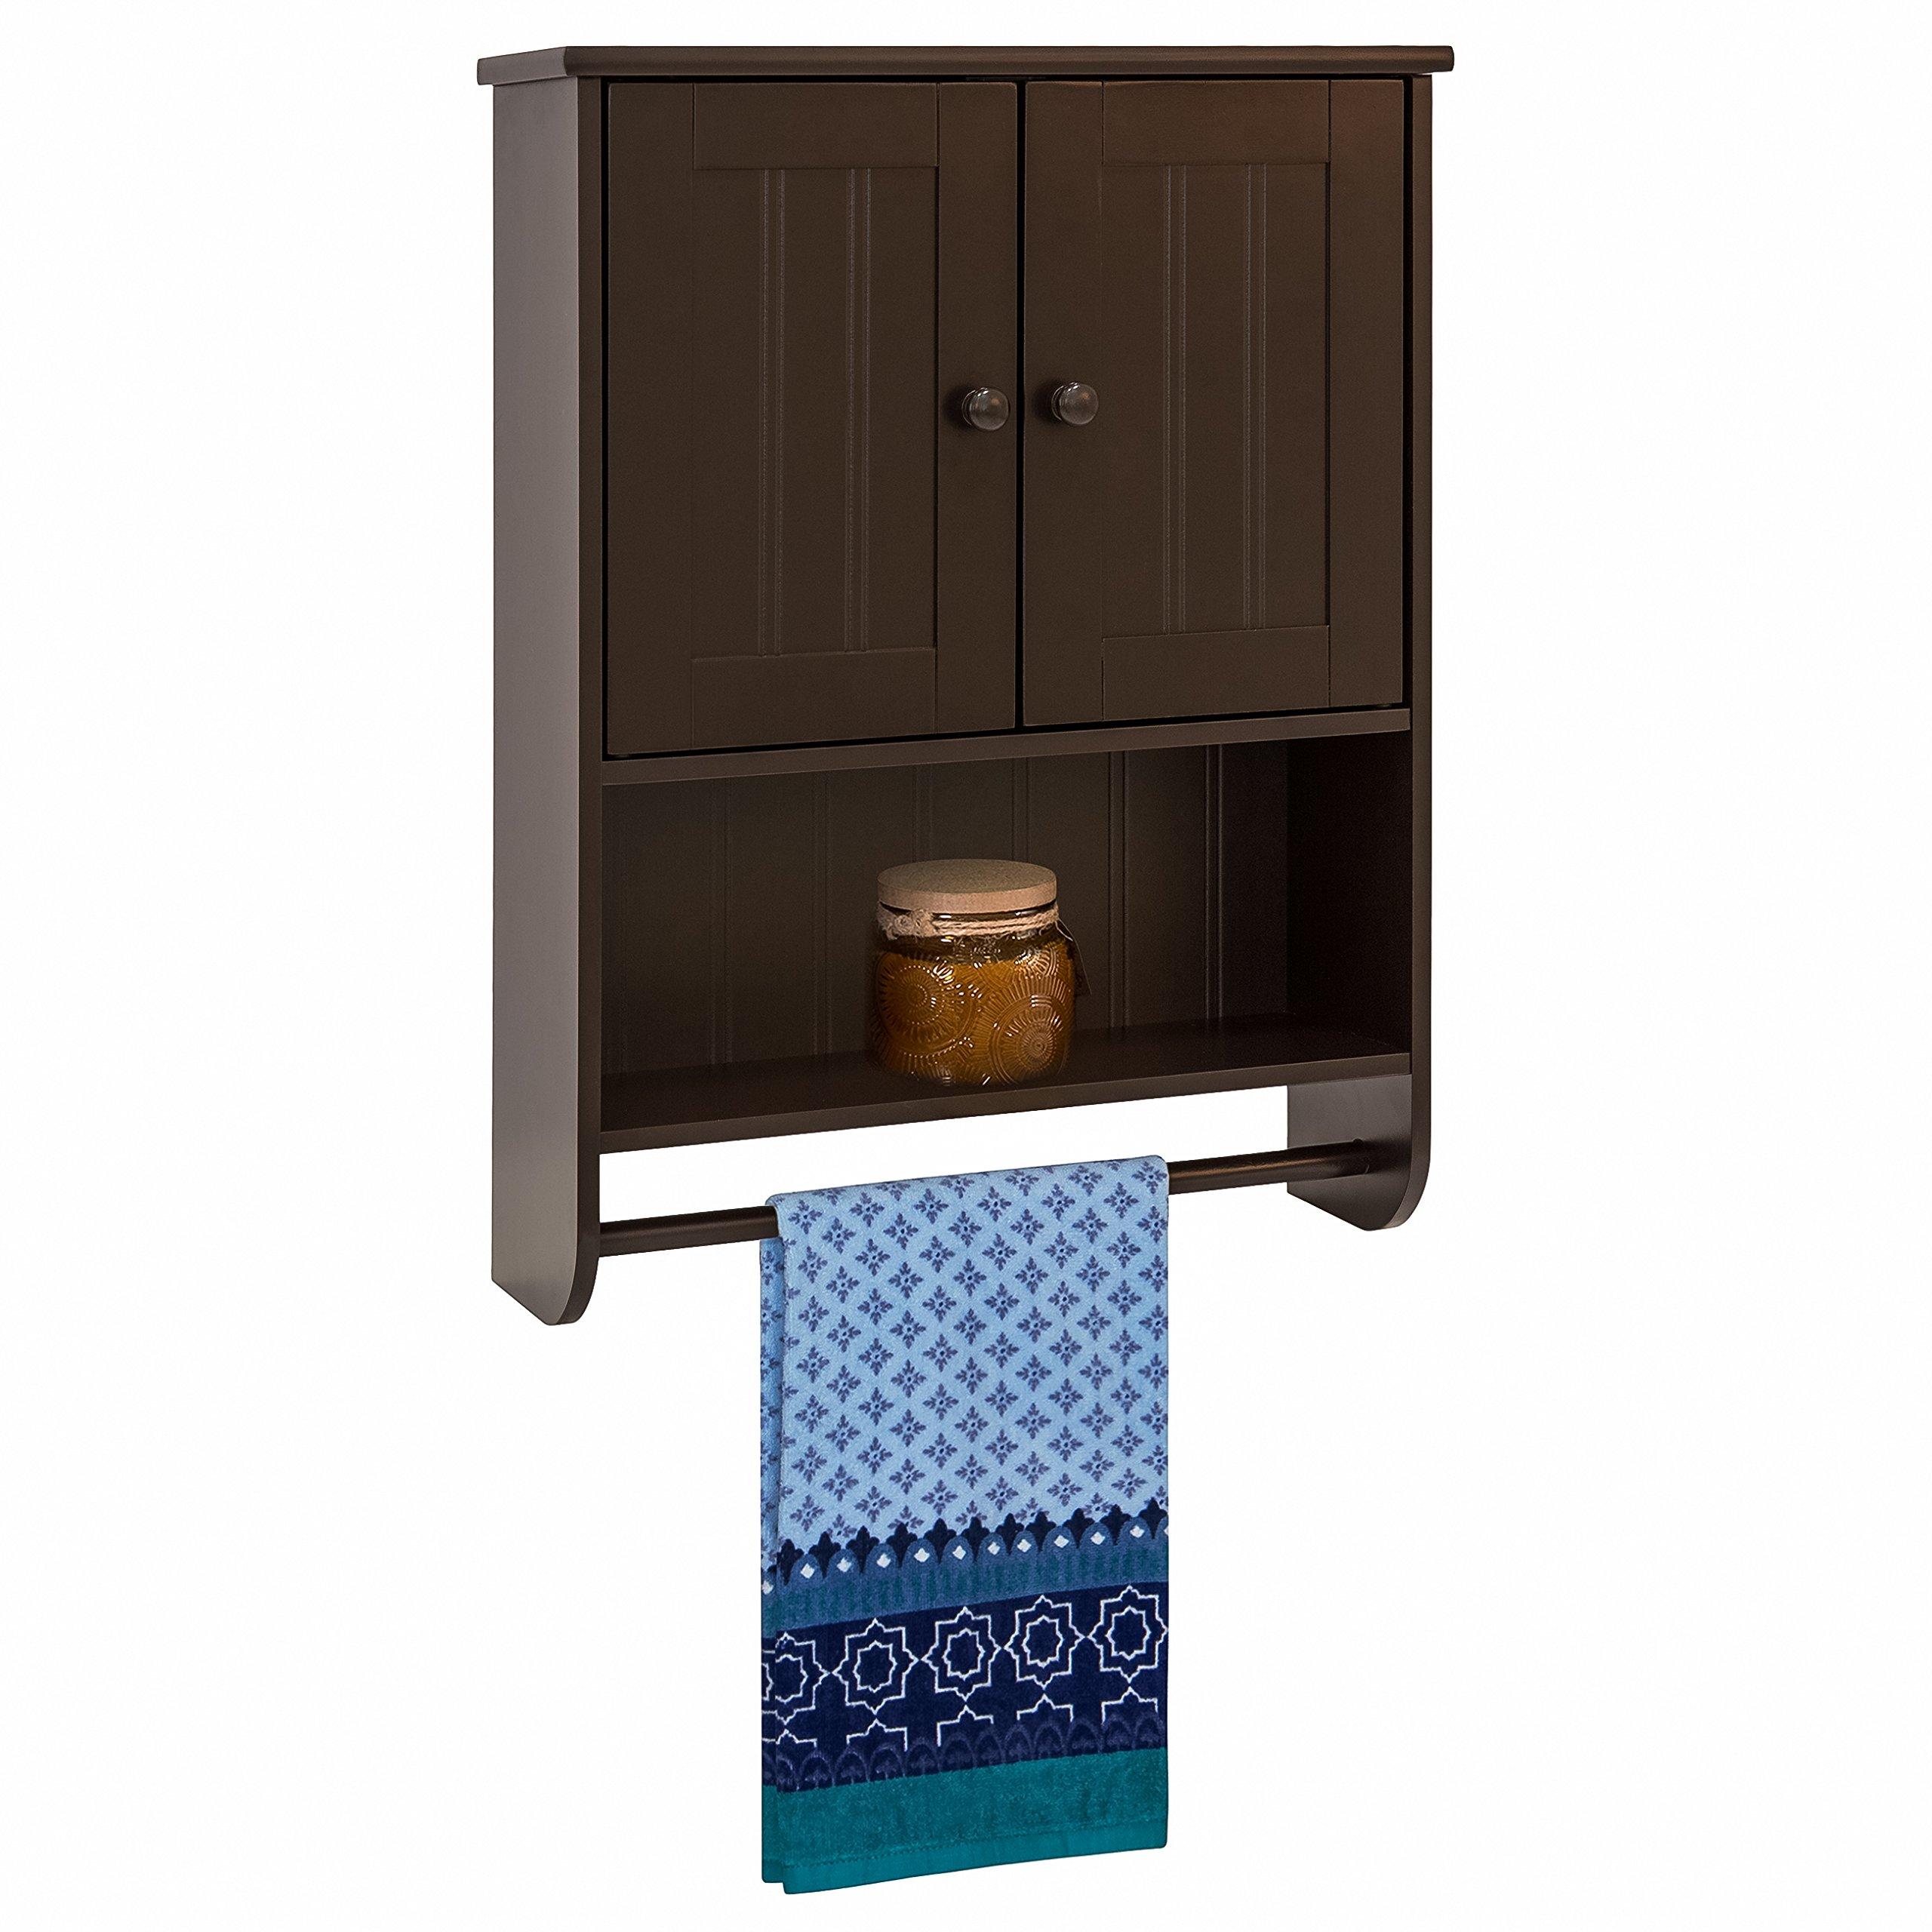 Best Choice Products Bathroom Storage Organization Wall Cabinet w/Double Doors, Towel Bar, Wainscot - Espresso Brown